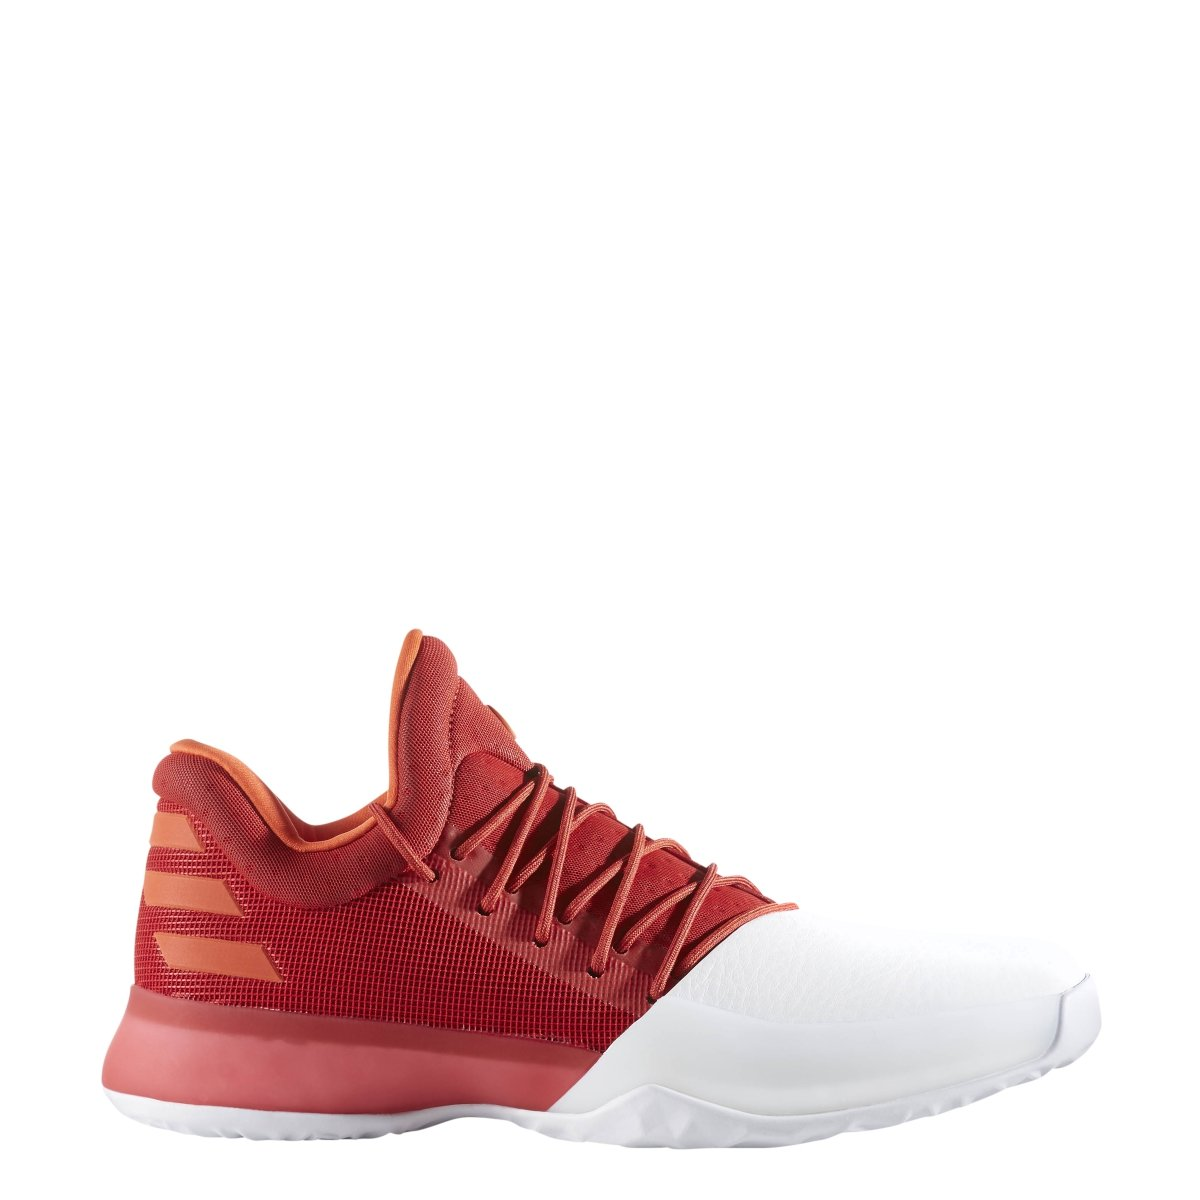 Adidas uomini harden 1 basket scarpa b01mt5leqh d (m) us